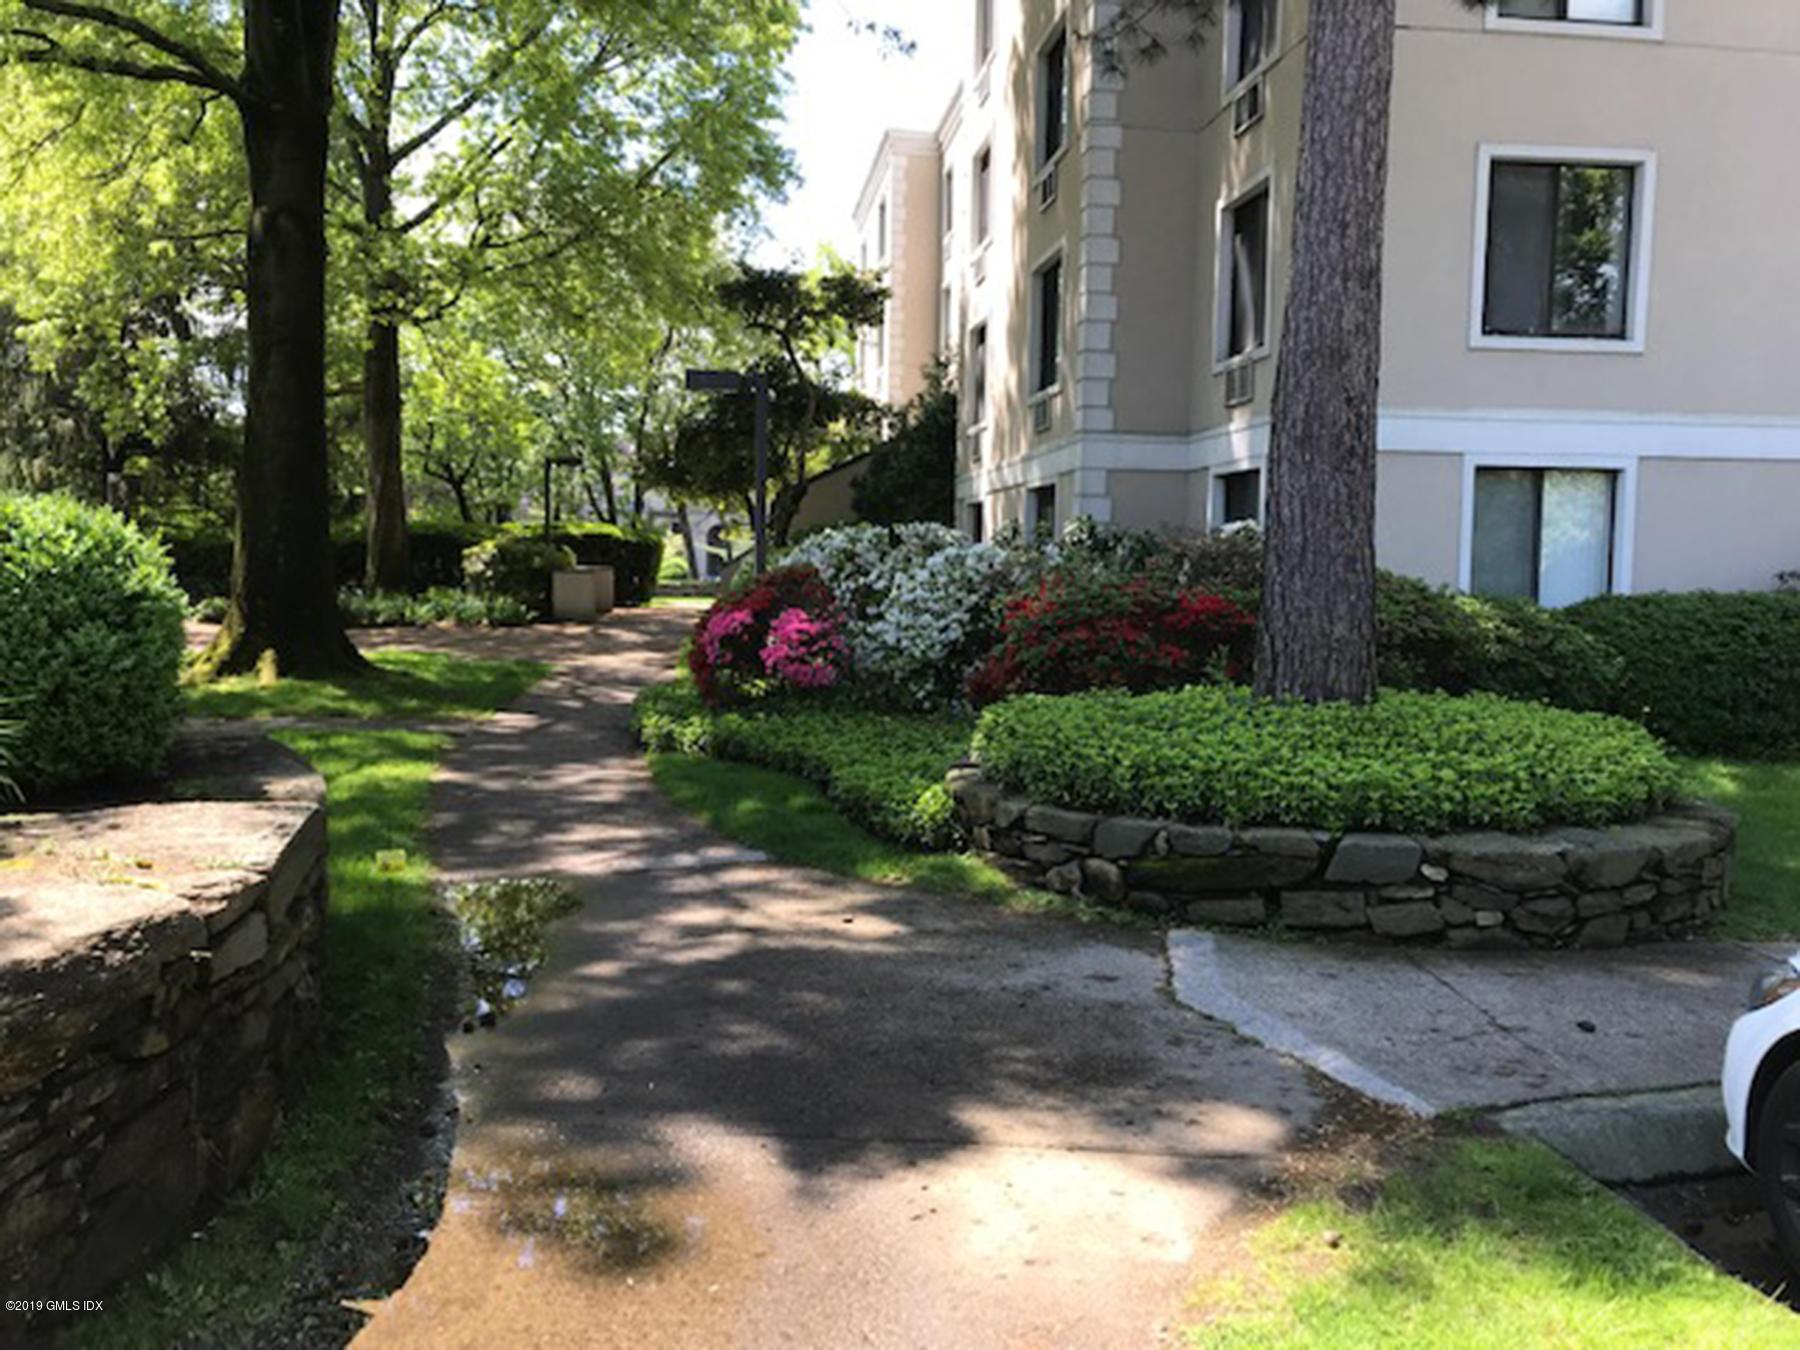 1525 Putnam Avenue,Old Greenwich,Connecticut 06870,1 Bedroom Bedrooms,1 BathroomBathrooms,Condominium,Putnam,106698